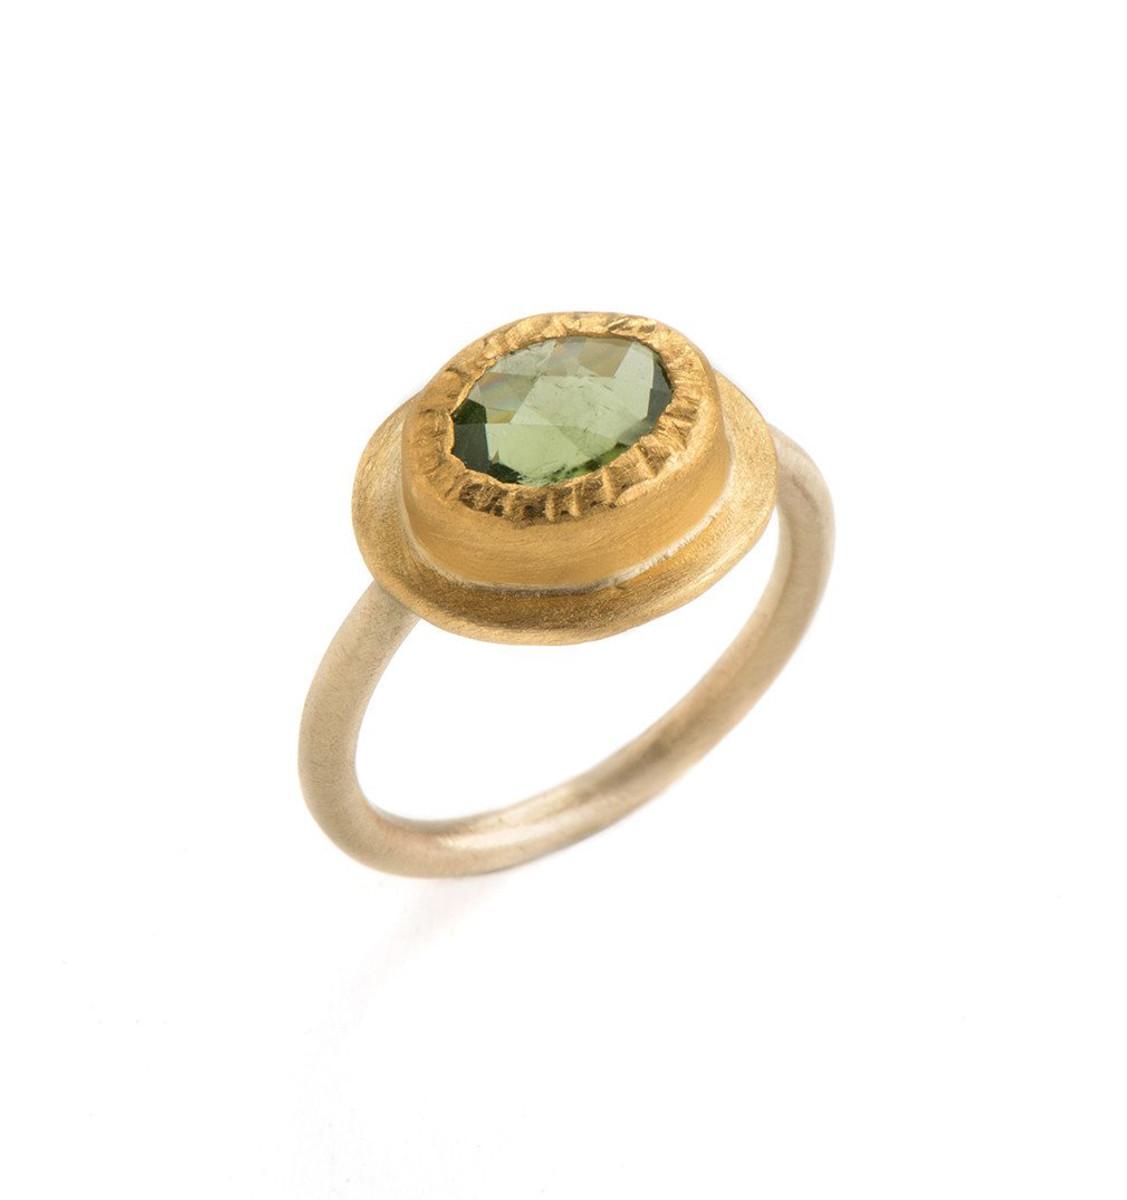 Fresh Mint Peridot Gold Ring by Nava Zahavi - New Arrival